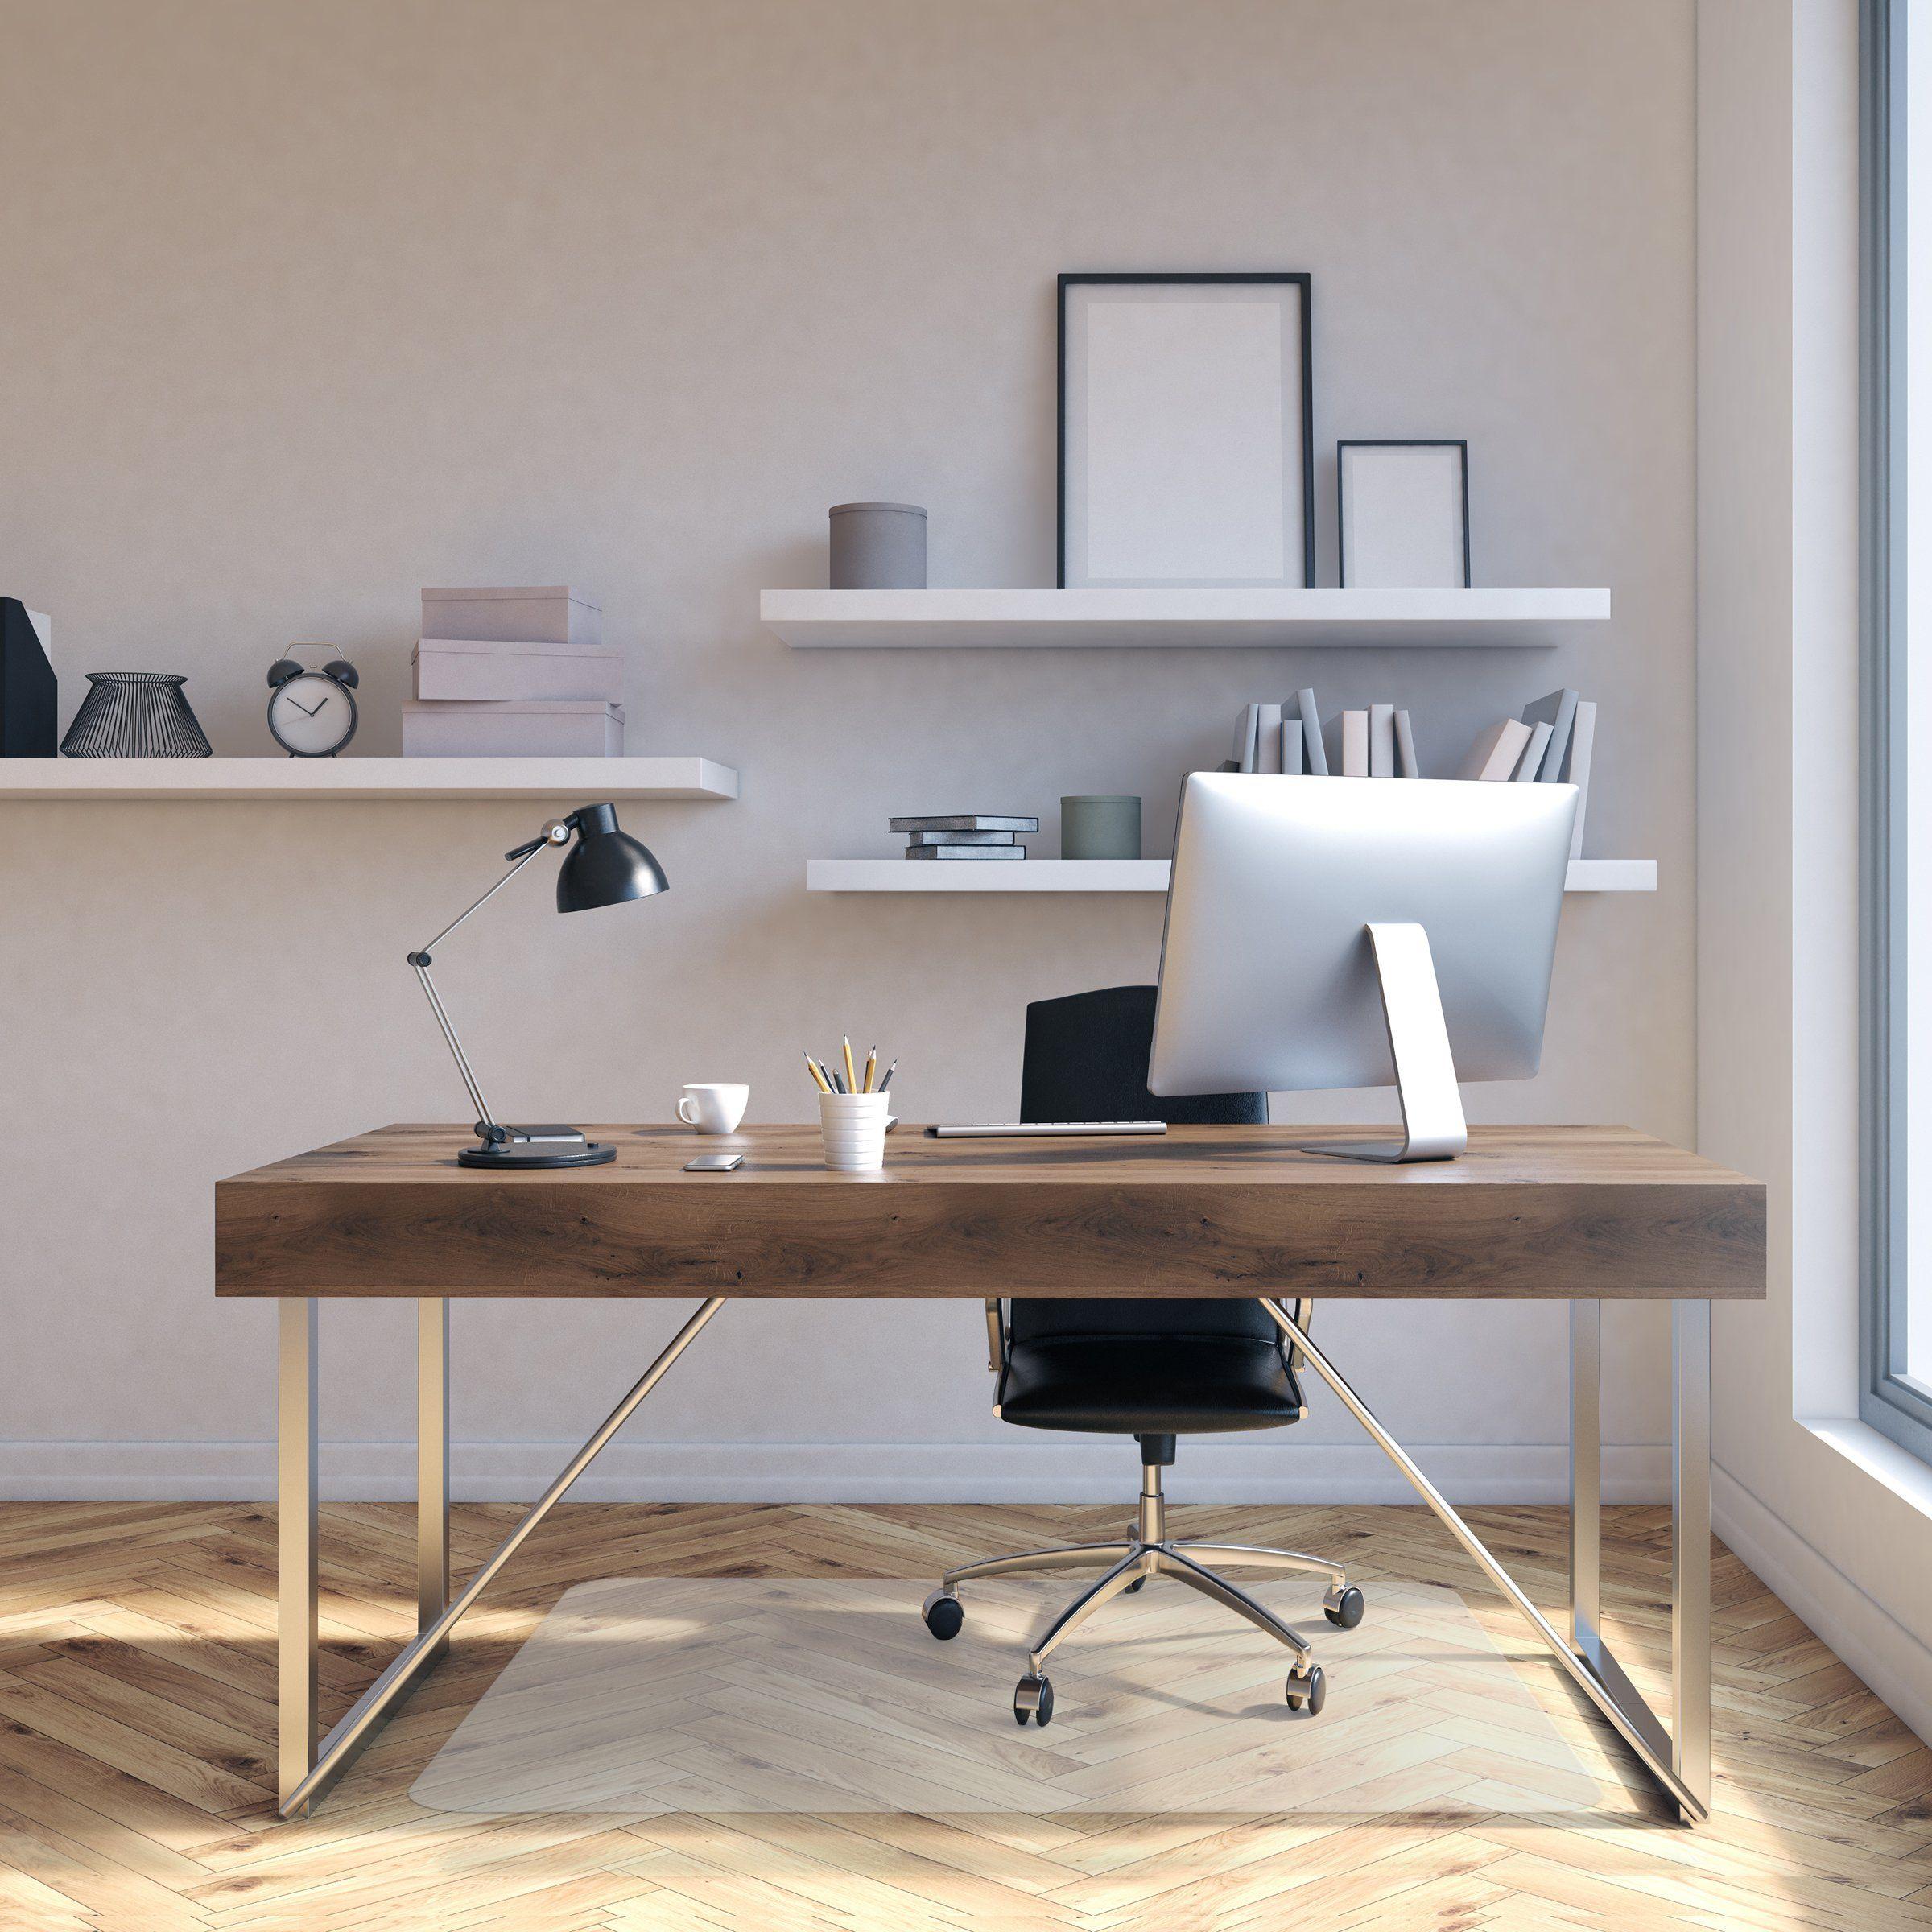 Office Chair Mat For Hardwood Floor Opaque Office Floor Mat Bpa Phthalate And Odor Free Multiple Sizes Availab Chair Mats Office Floor Mats Office Chair Mat